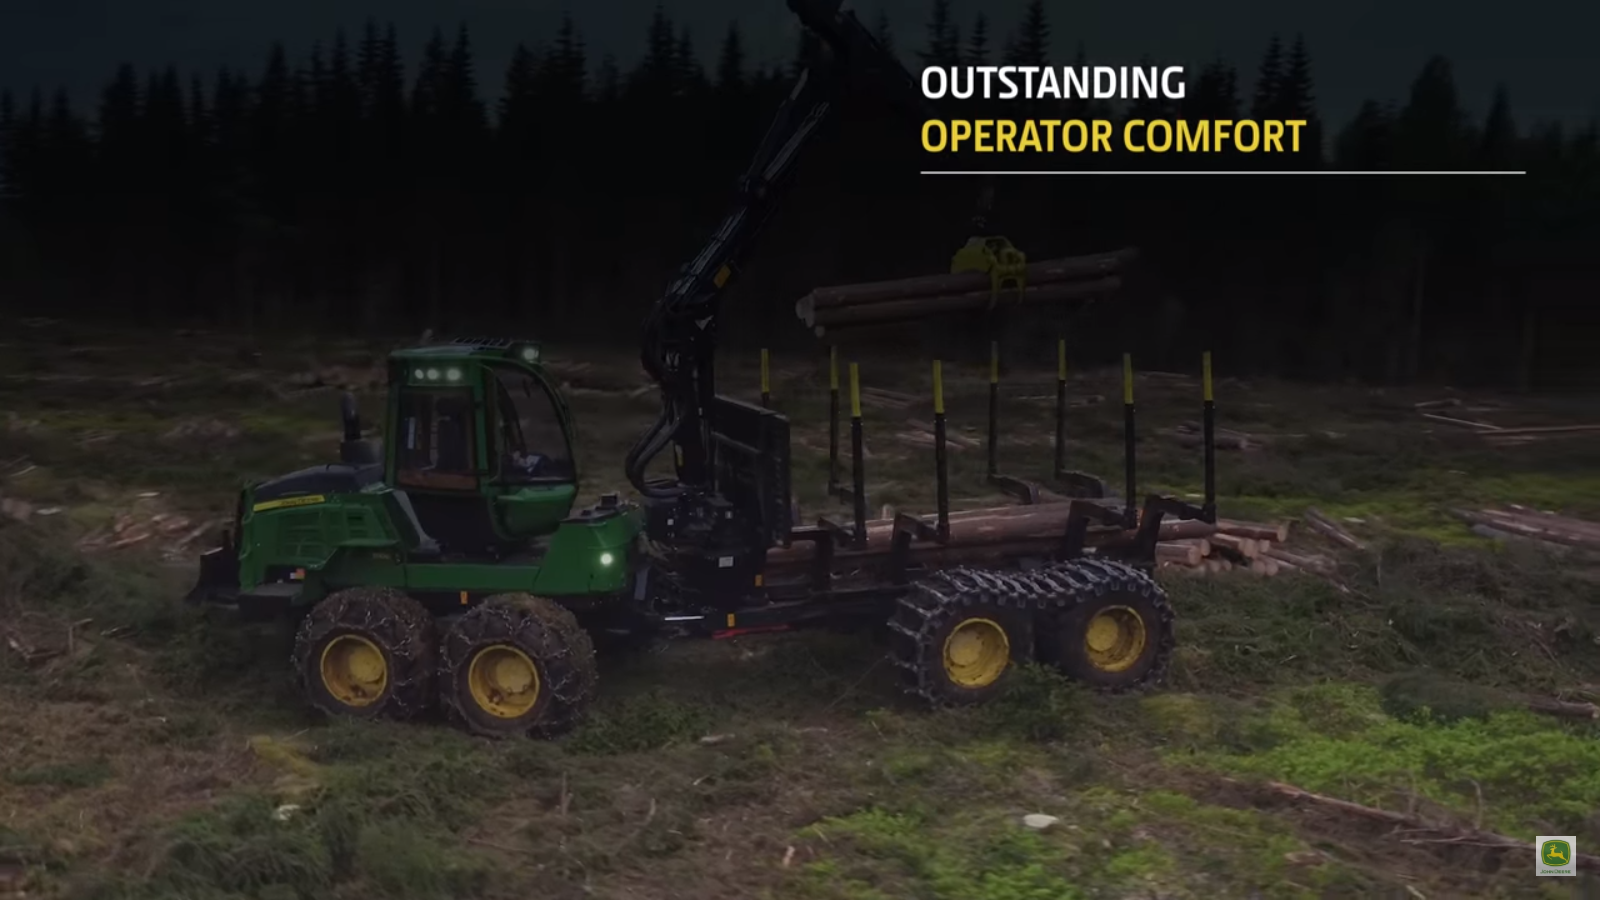 John Deere forestry 1510G forwarder in action   Industrial